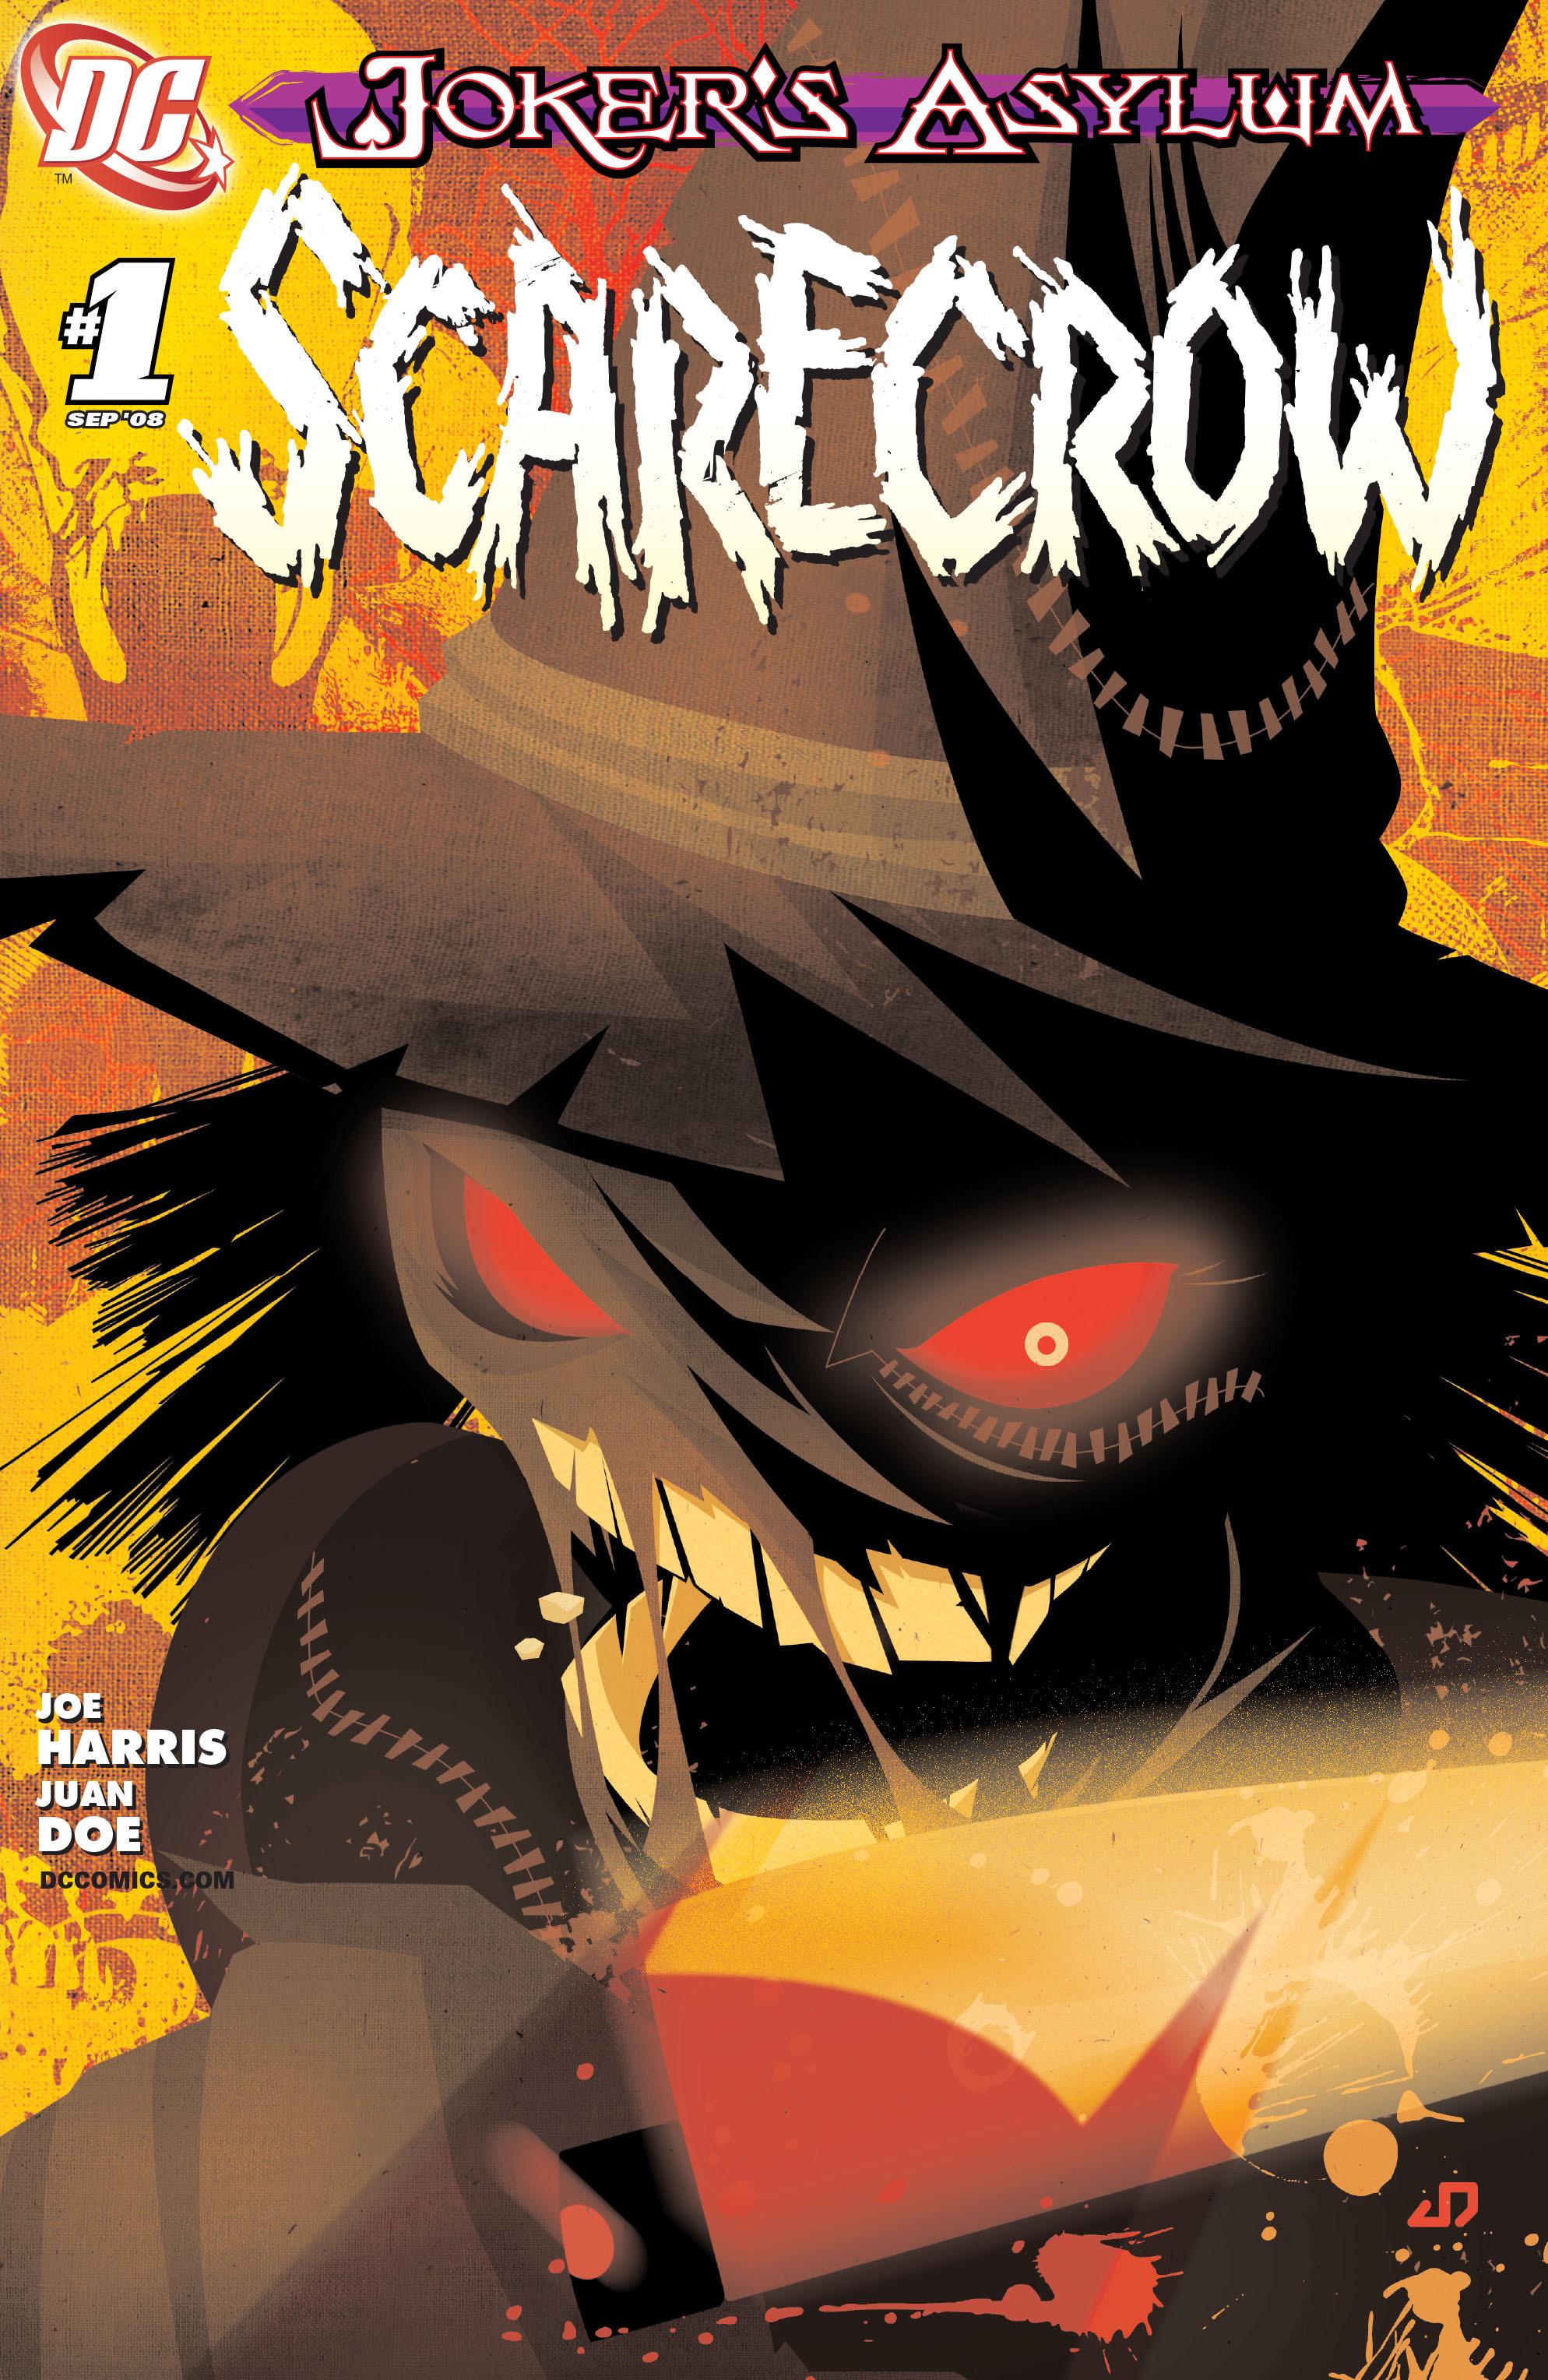 Read online Joker's Asylum: Scarecrow comic -  Issue # Full - 1